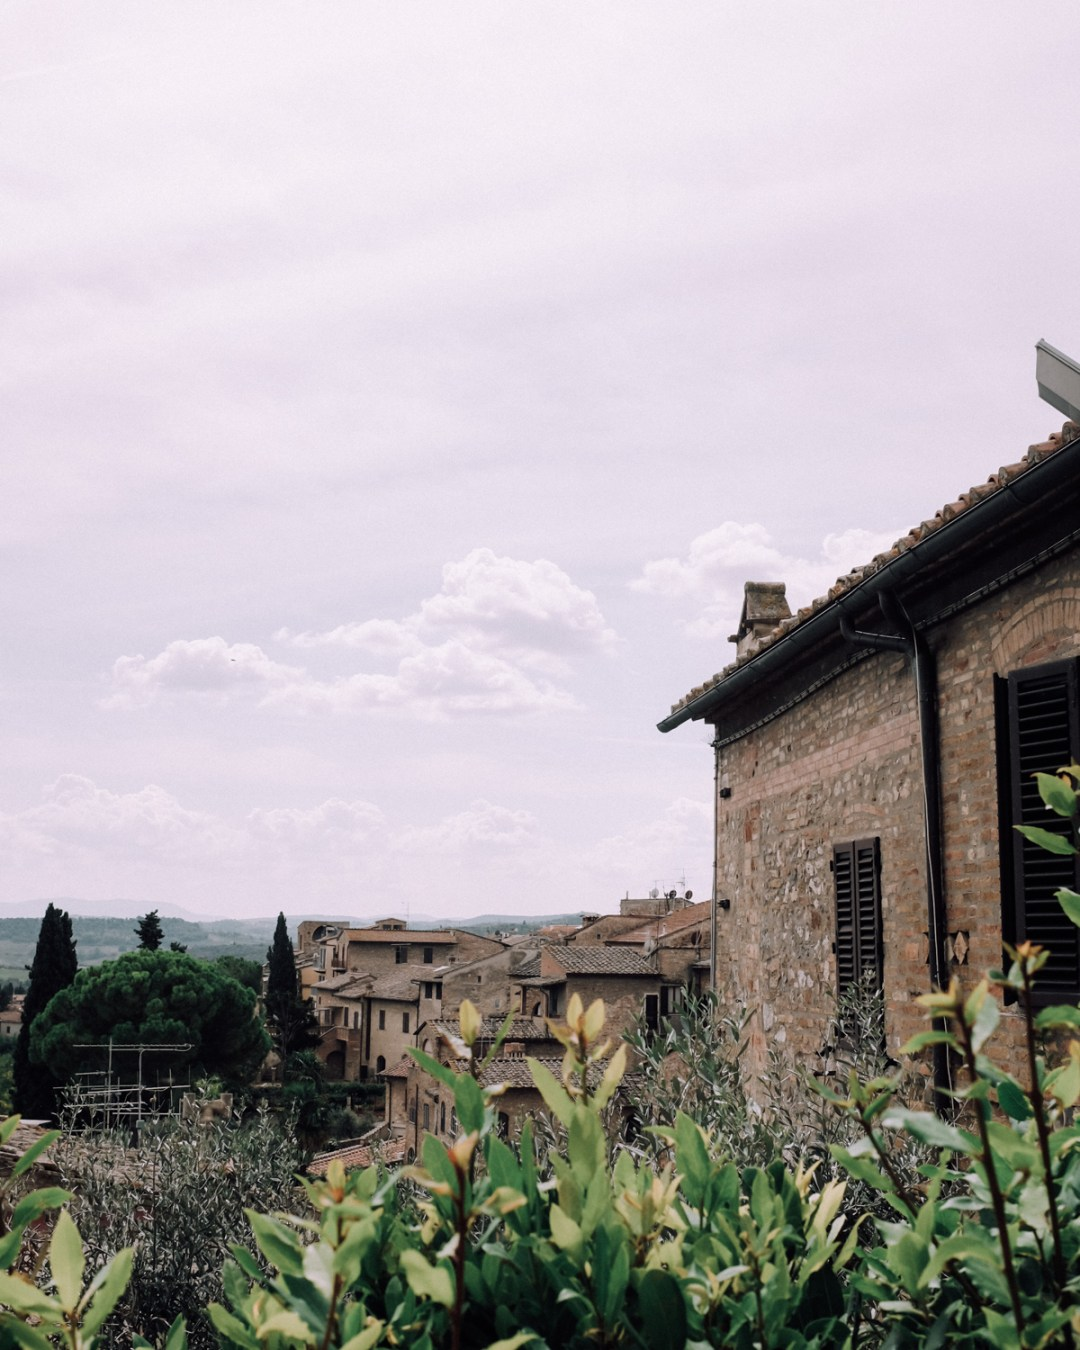 inastil, Ü50Blogger, Reiseblogger, Toskana, Villa, Florenz, Siena, Certaldo, Lifestyle, Italienreise, Italienliebe, Cabriotour-23